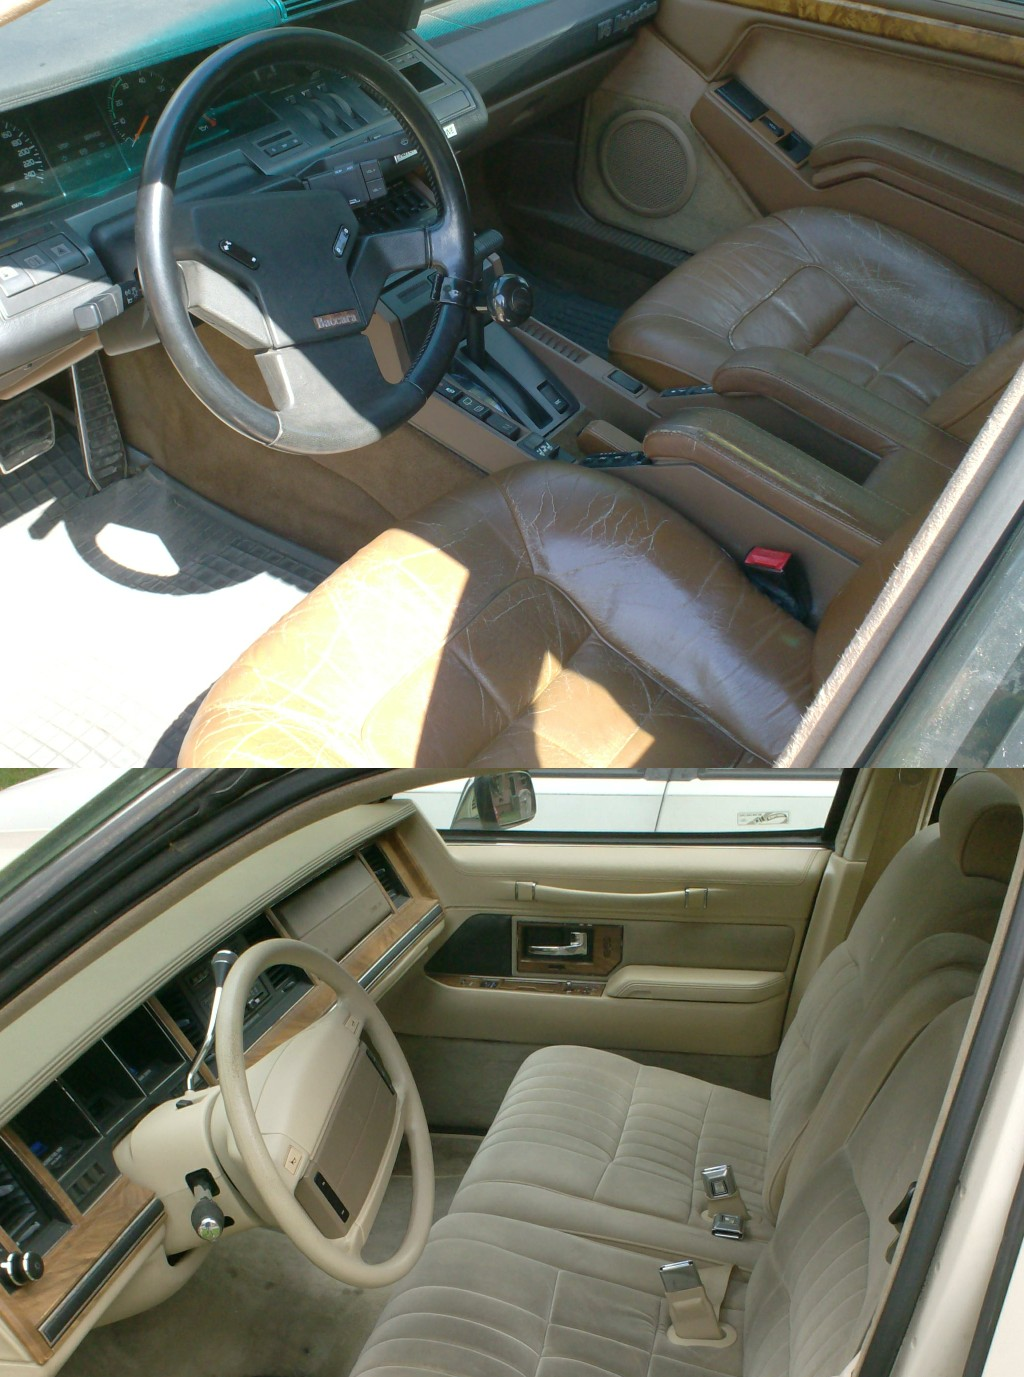 RENAULT 25 interior